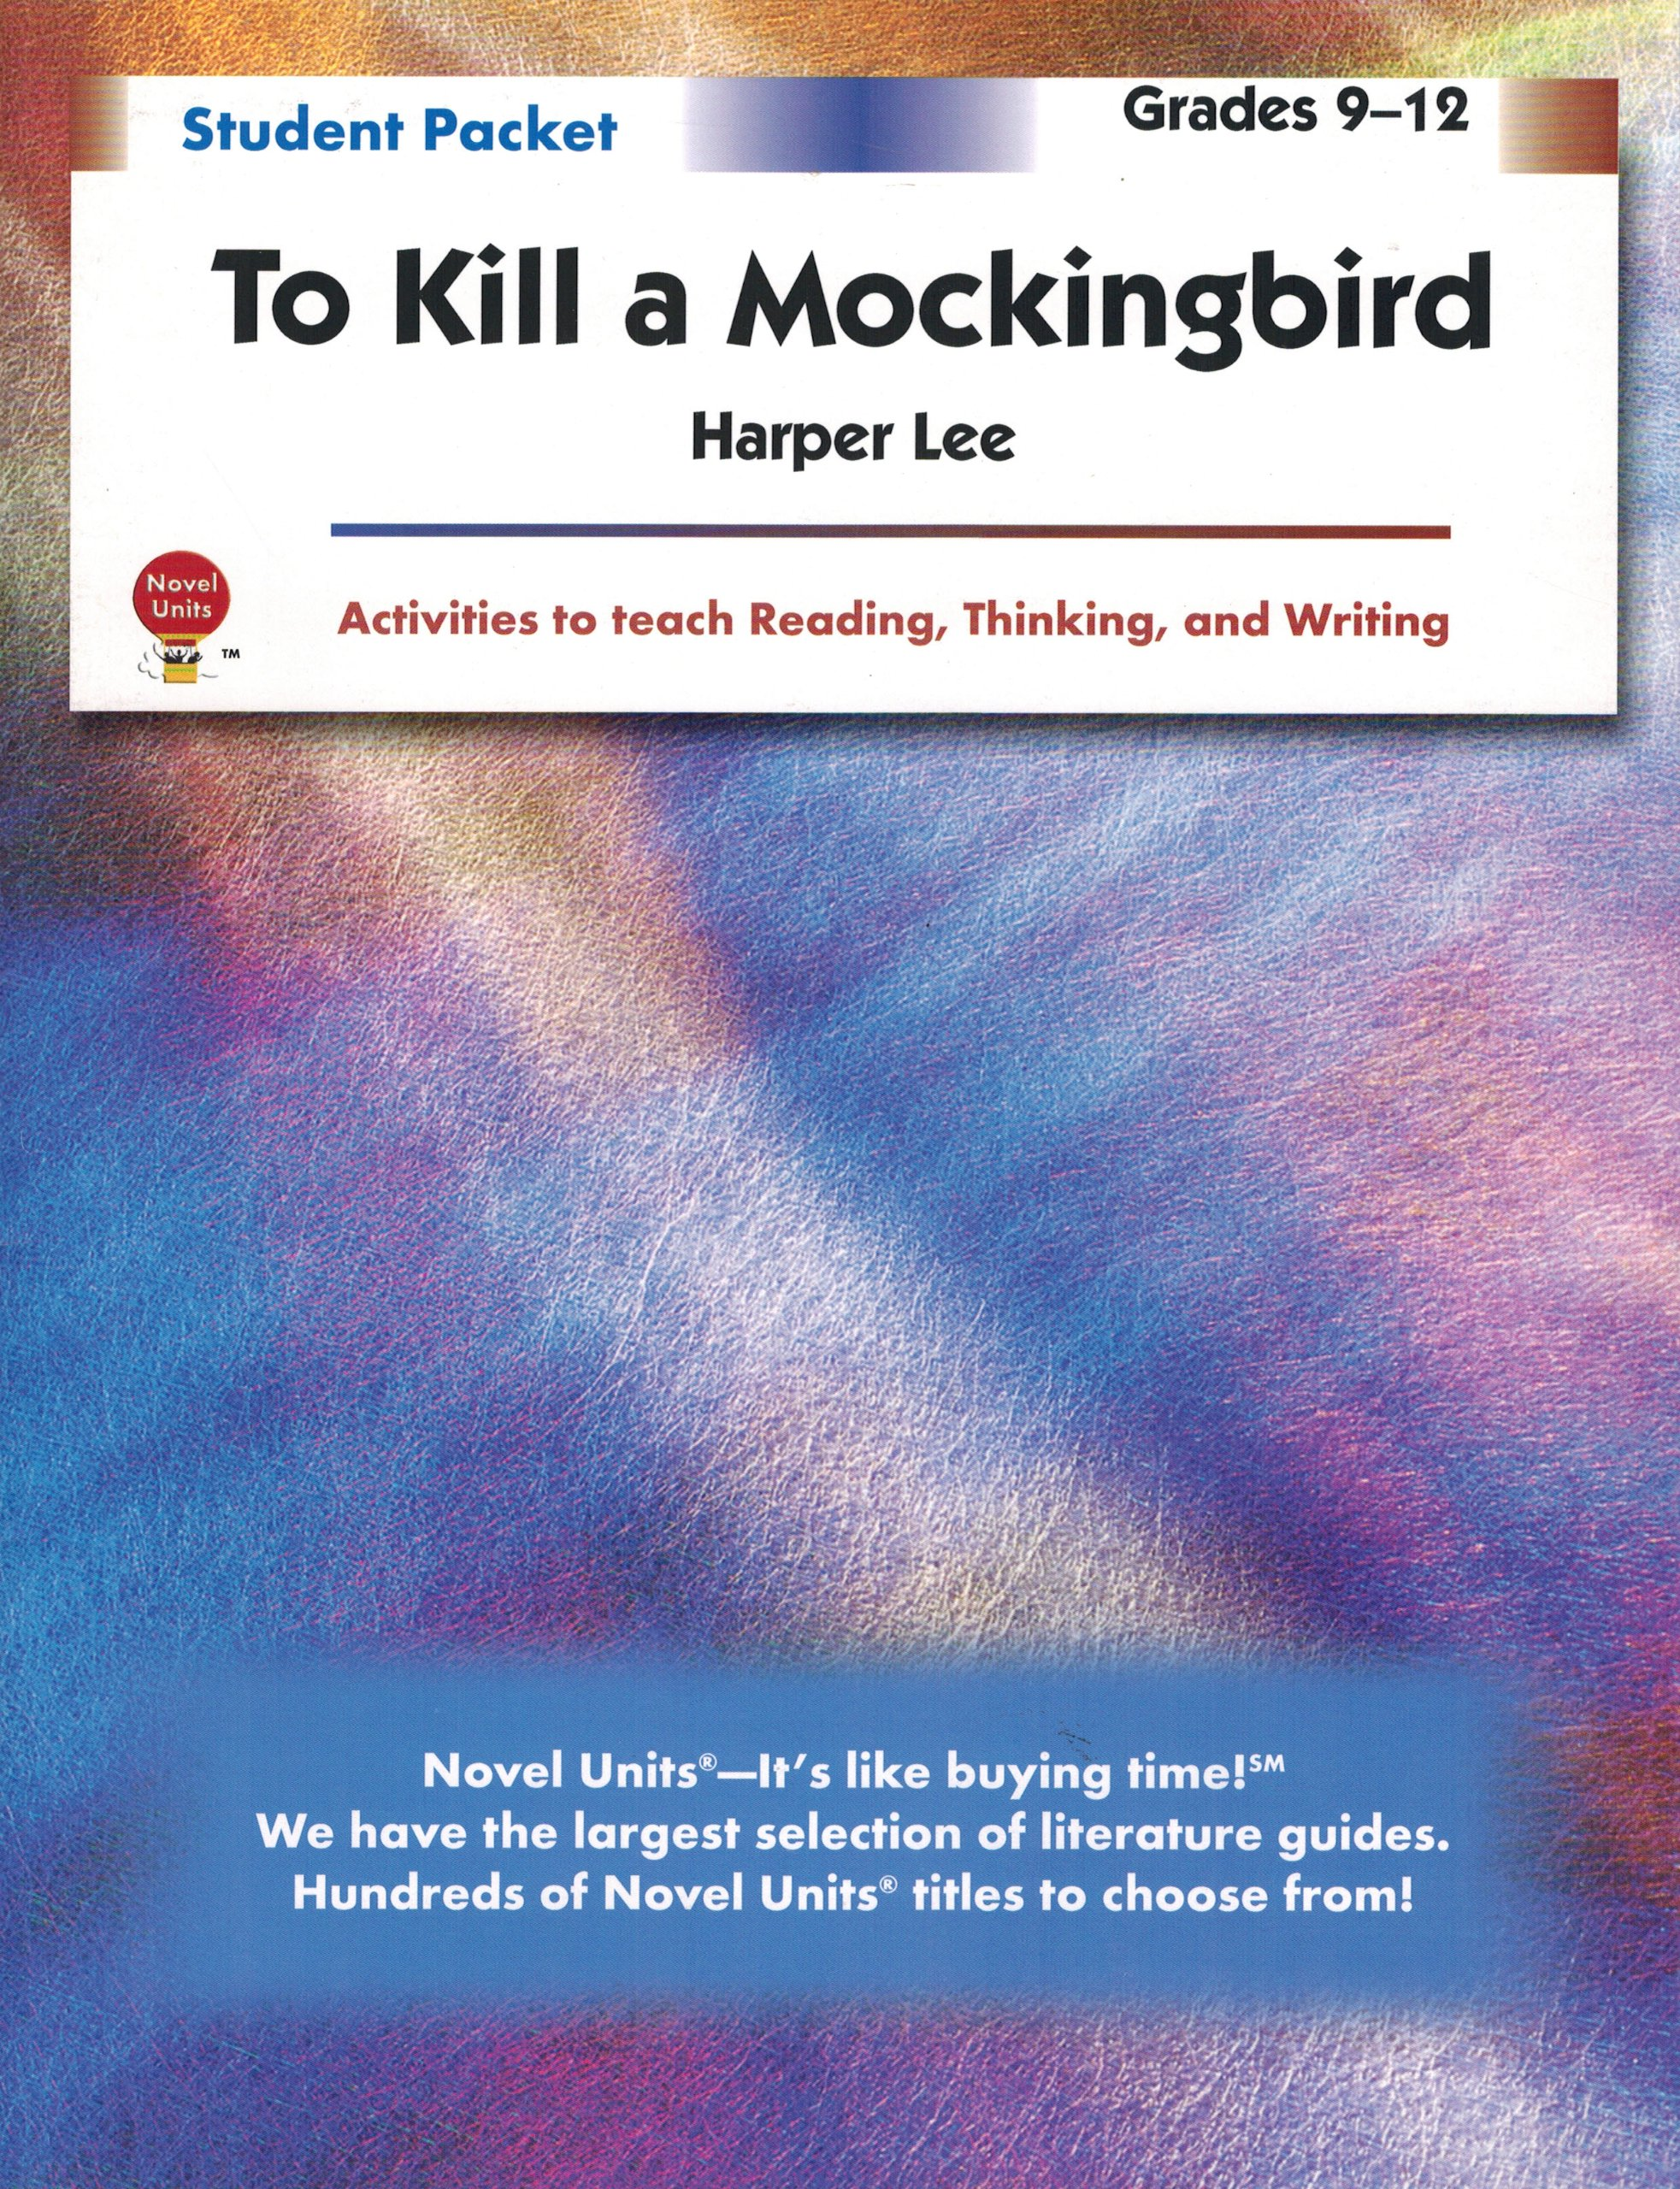 To Kill A Mockingbird - Student Packet by Novel Units pdf